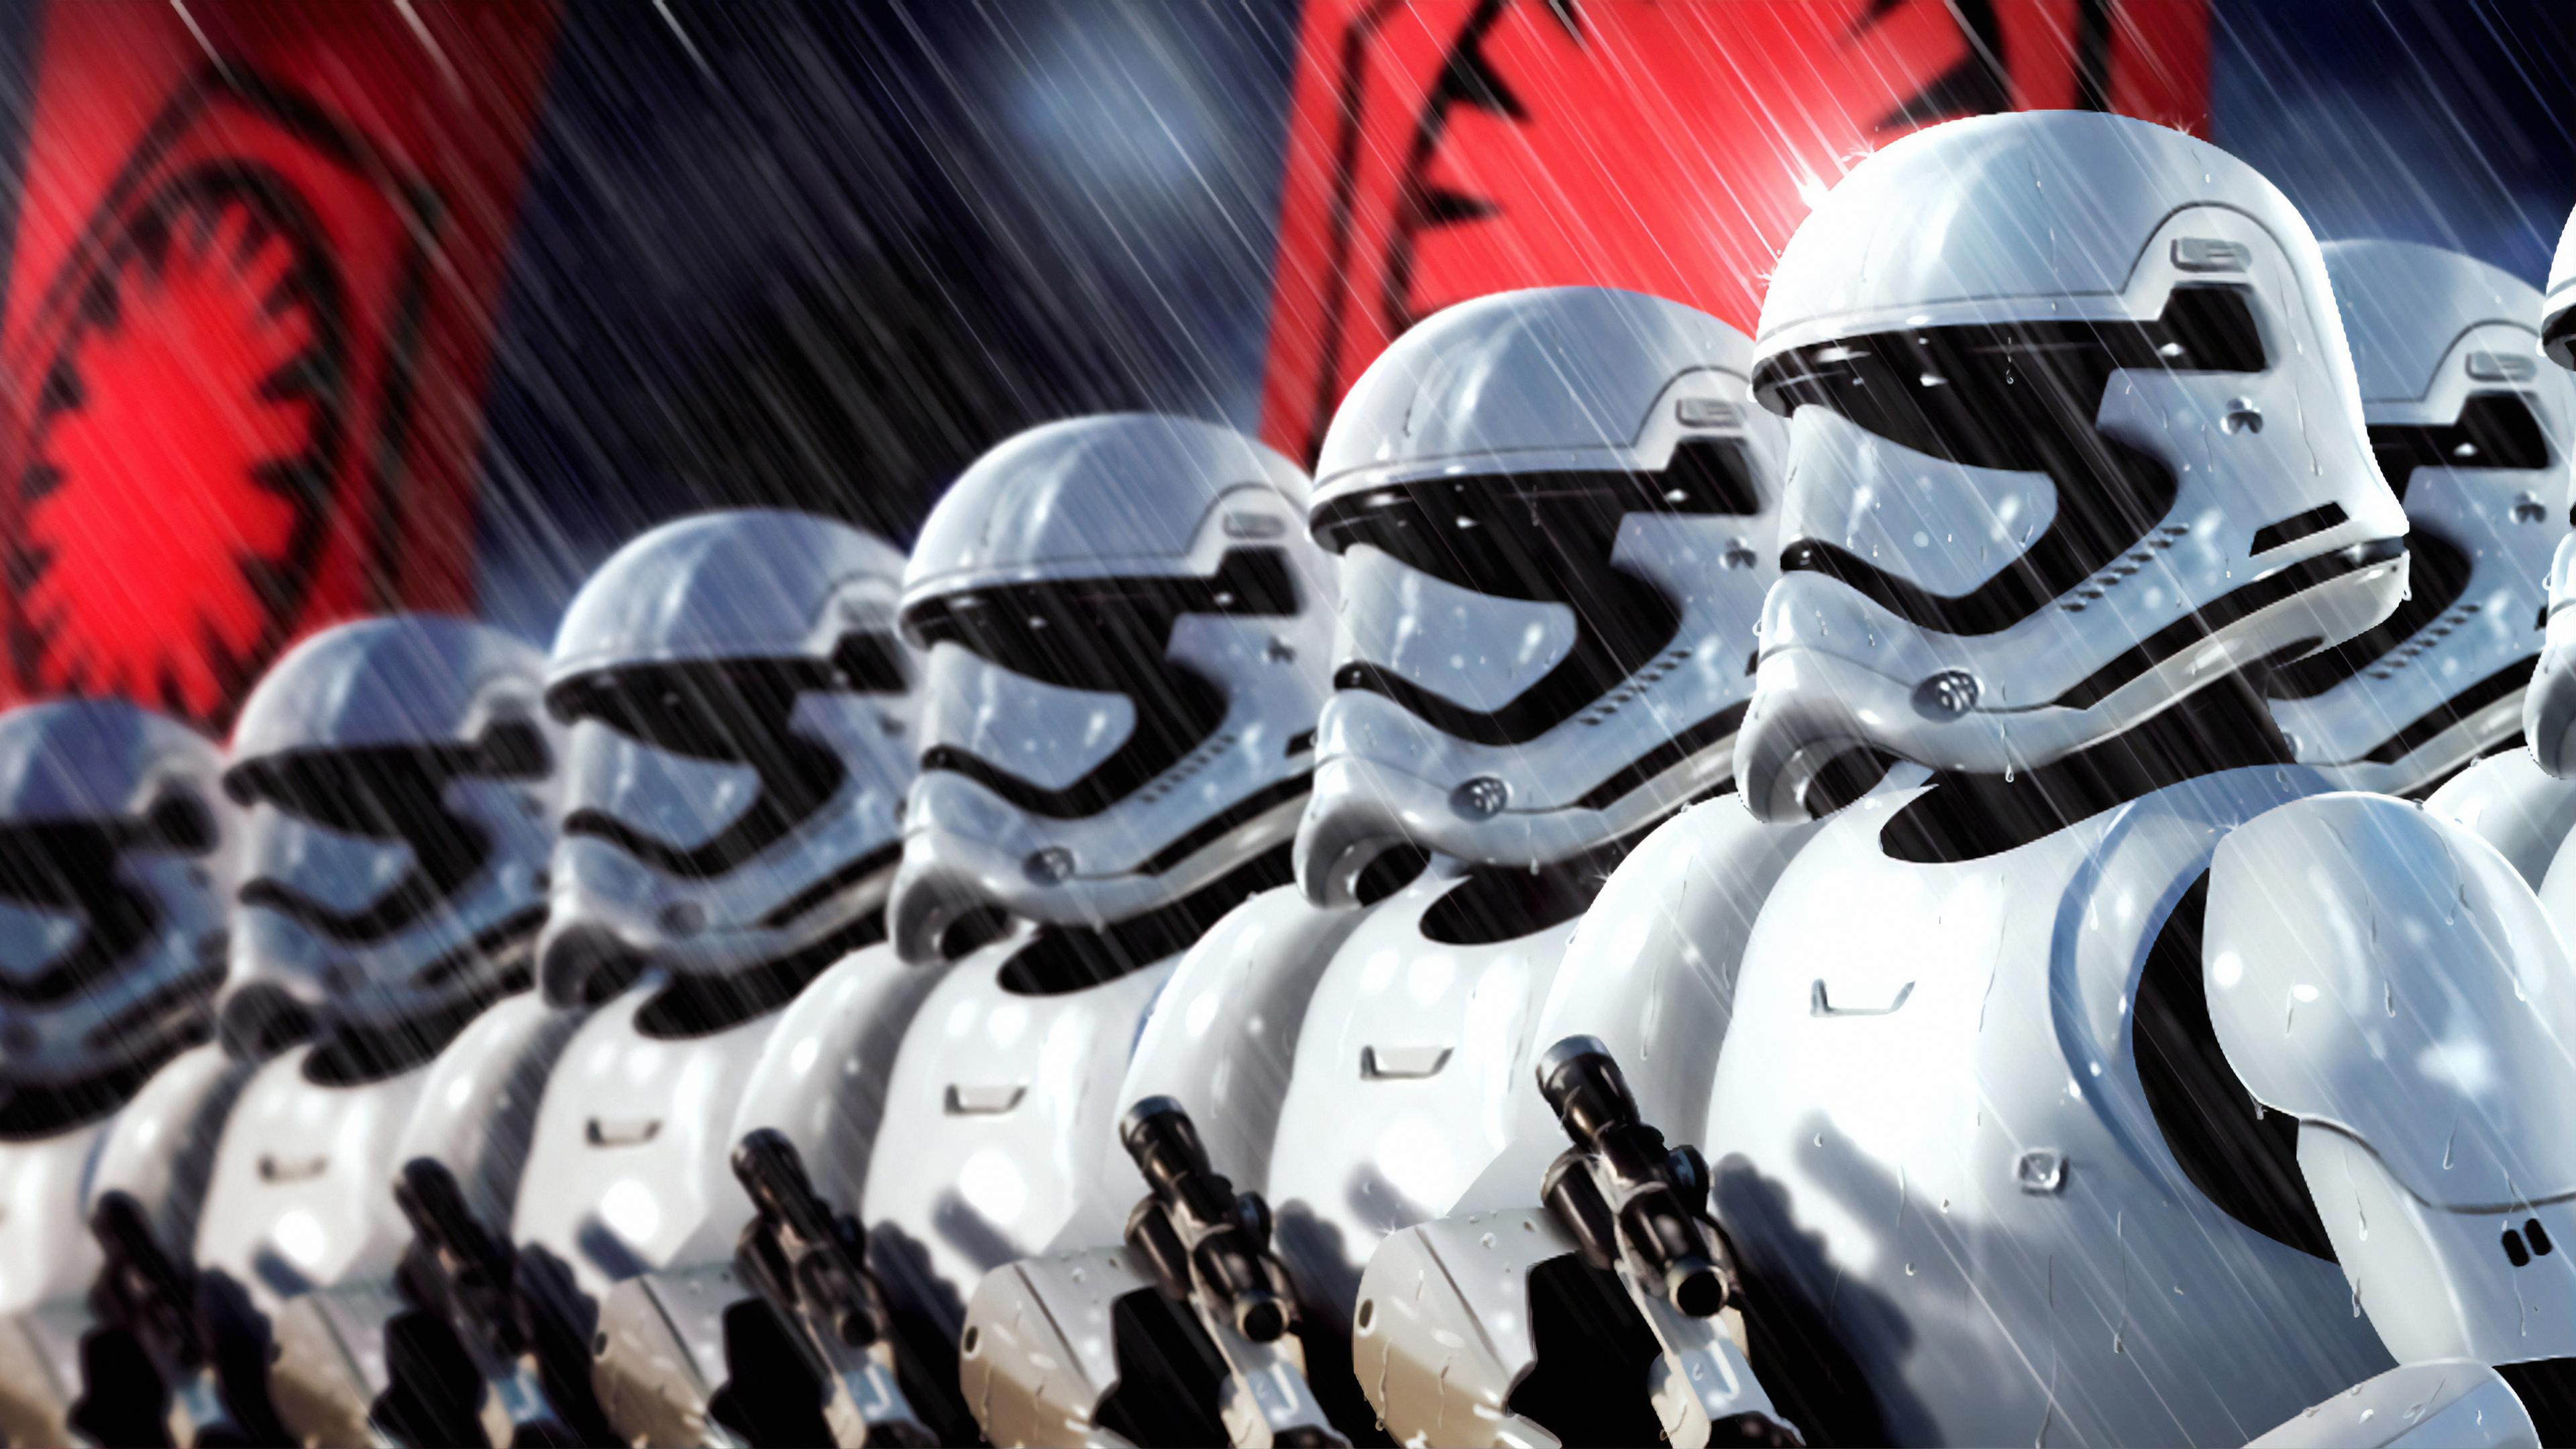 Stormtroopers Art Star Wars Stormtrooper Wallpaper Hd 3840x2160 Wallpaper Teahub Io